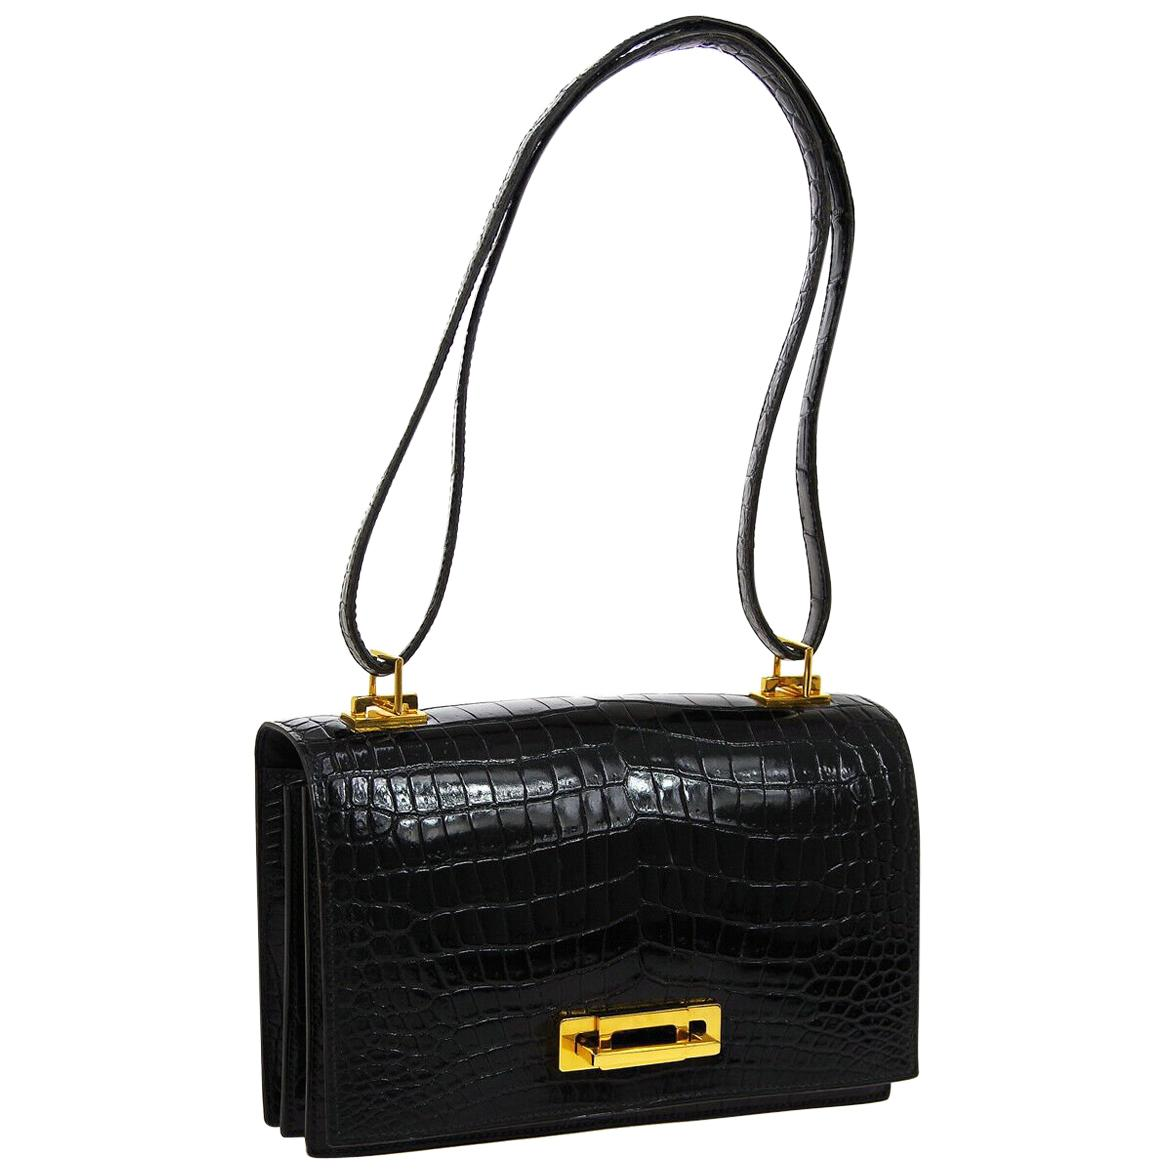 53712ff82566 Crocodile Leather Handbags - 546 For Sale on 1stdibs